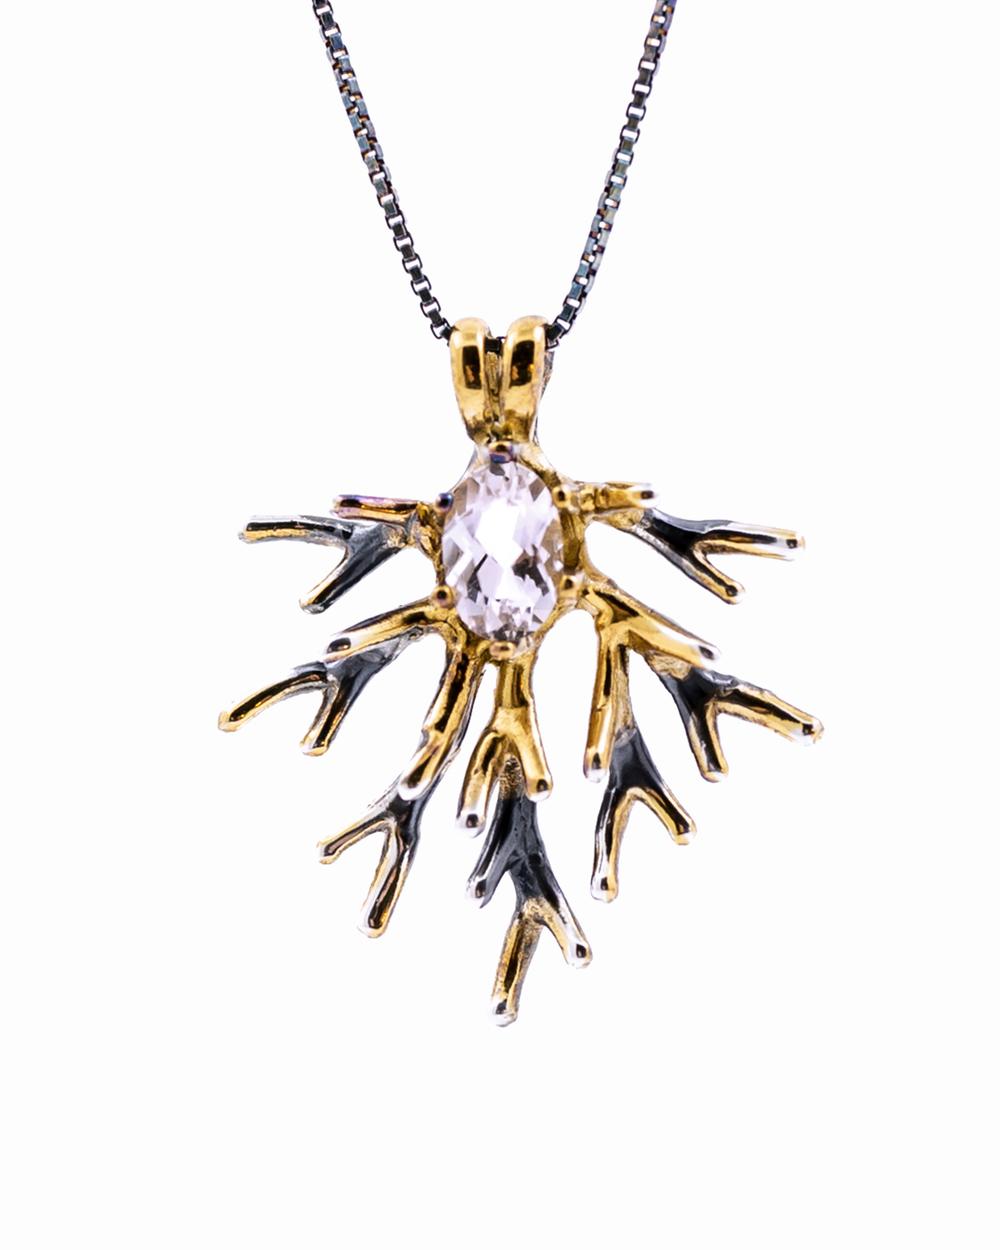 Unfolding Pendant, sterling silver, morganite, gold vermeil, patina 2015